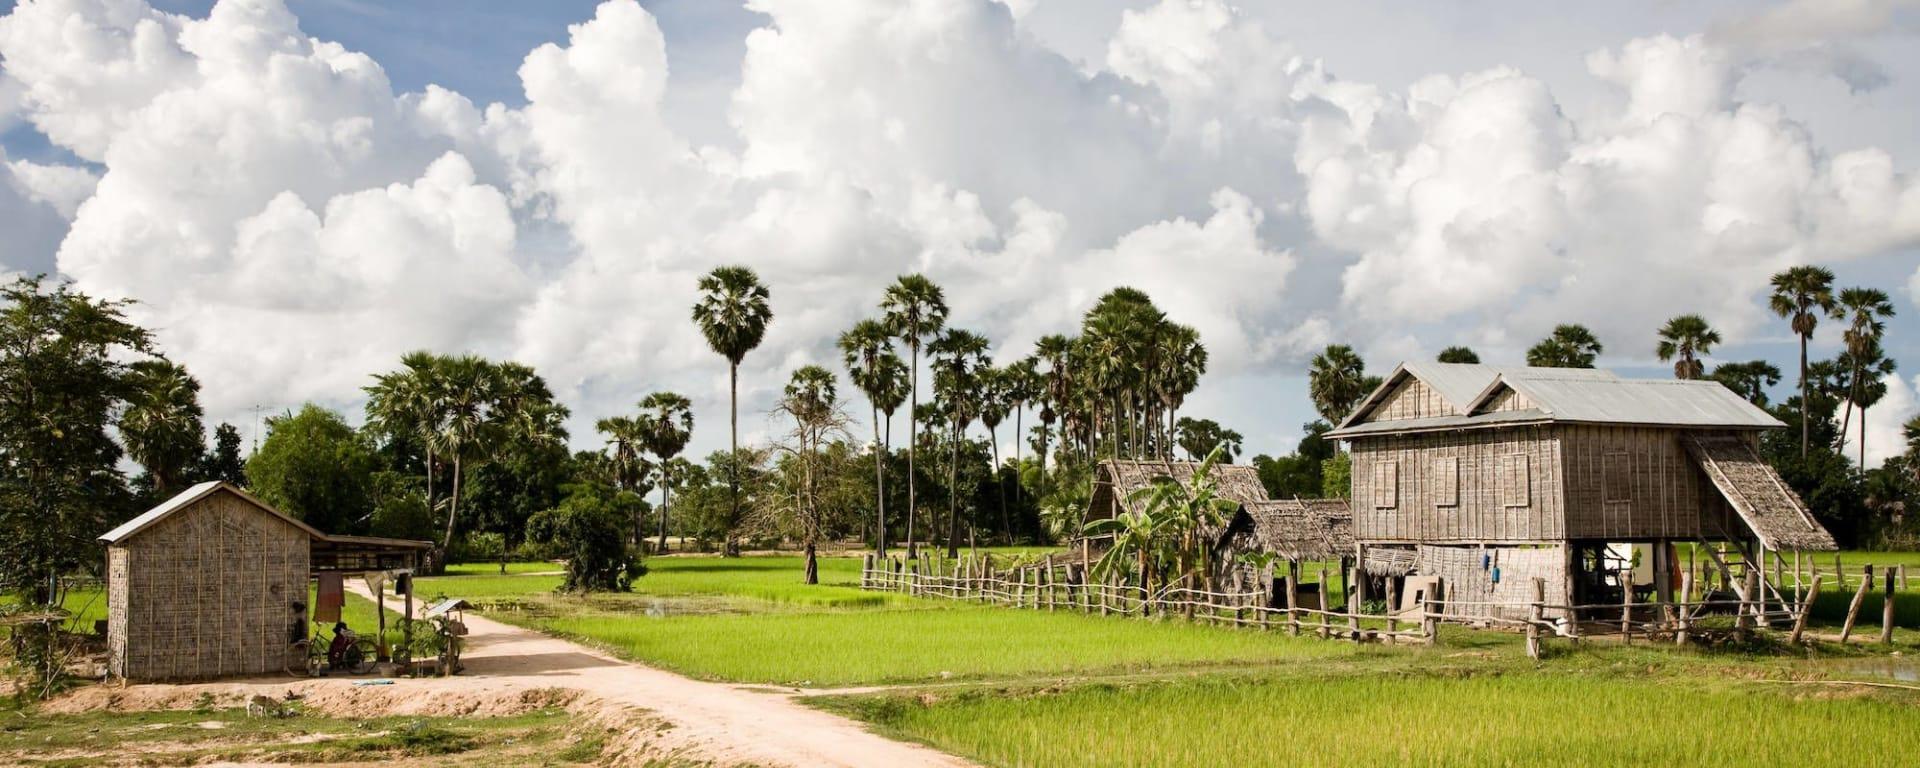 Battambang - le grenier à riz du Cambodge (Siem Reap - Ko Chang): Battambang rural aerea